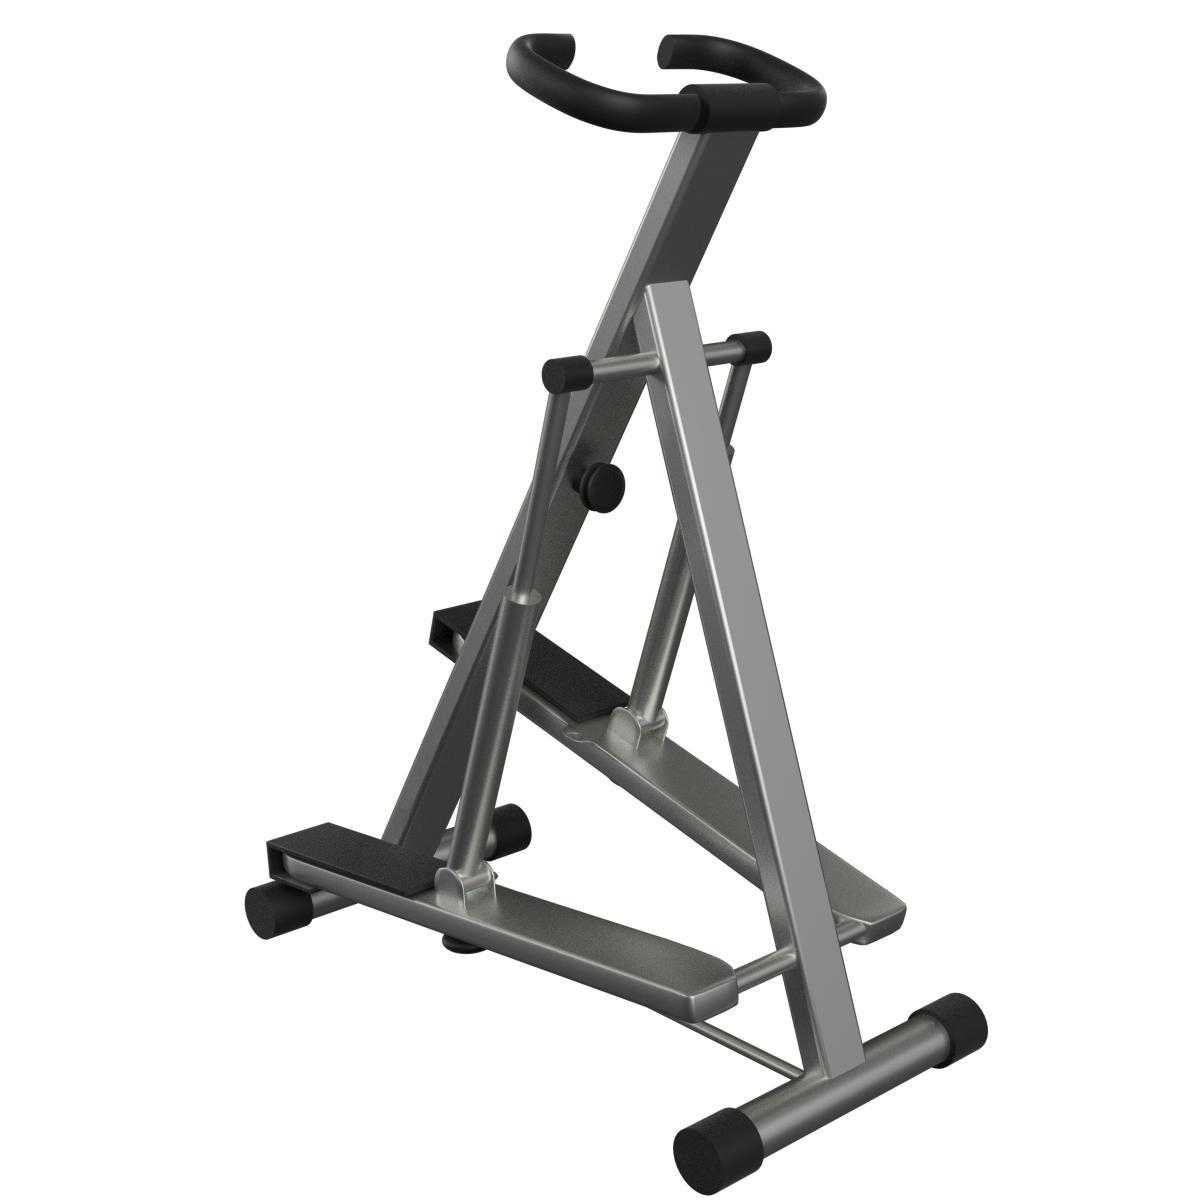 Gym Equipment - Stepper Glute Machine